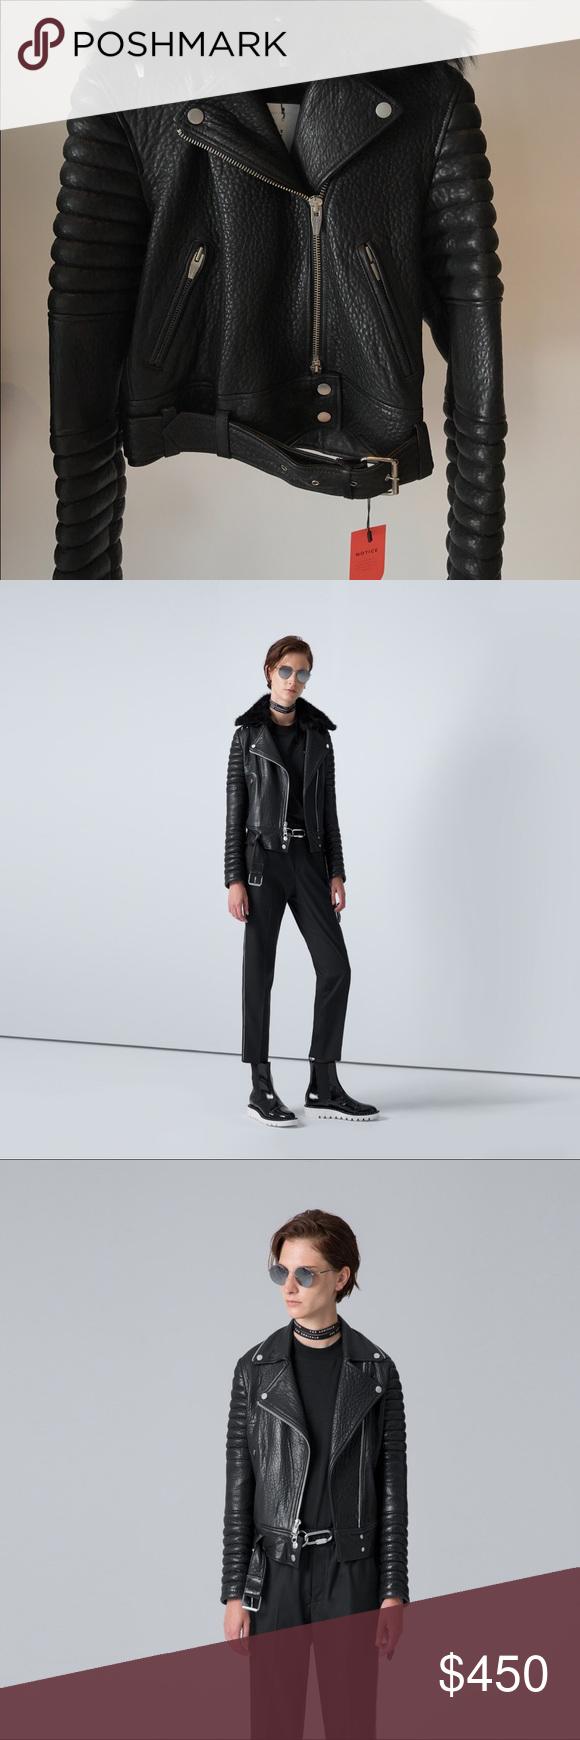 The Arrivals Rainier Black Size Xs M Leather Jacket Women Shopping Black [ 1740 x 580 Pixel ]